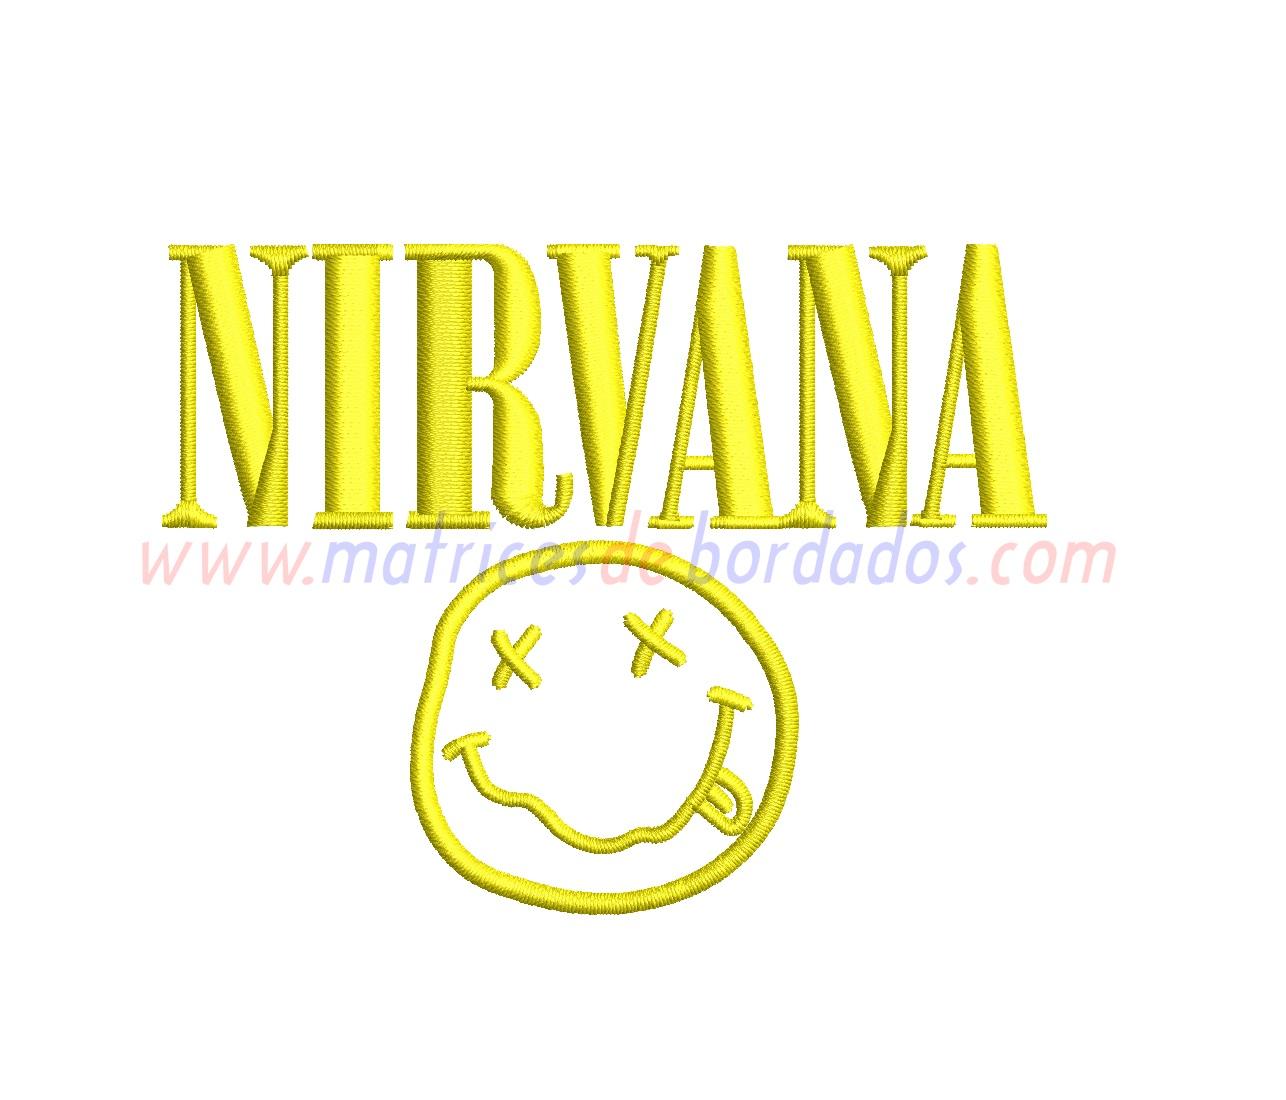 LG37NQ - Nirvana